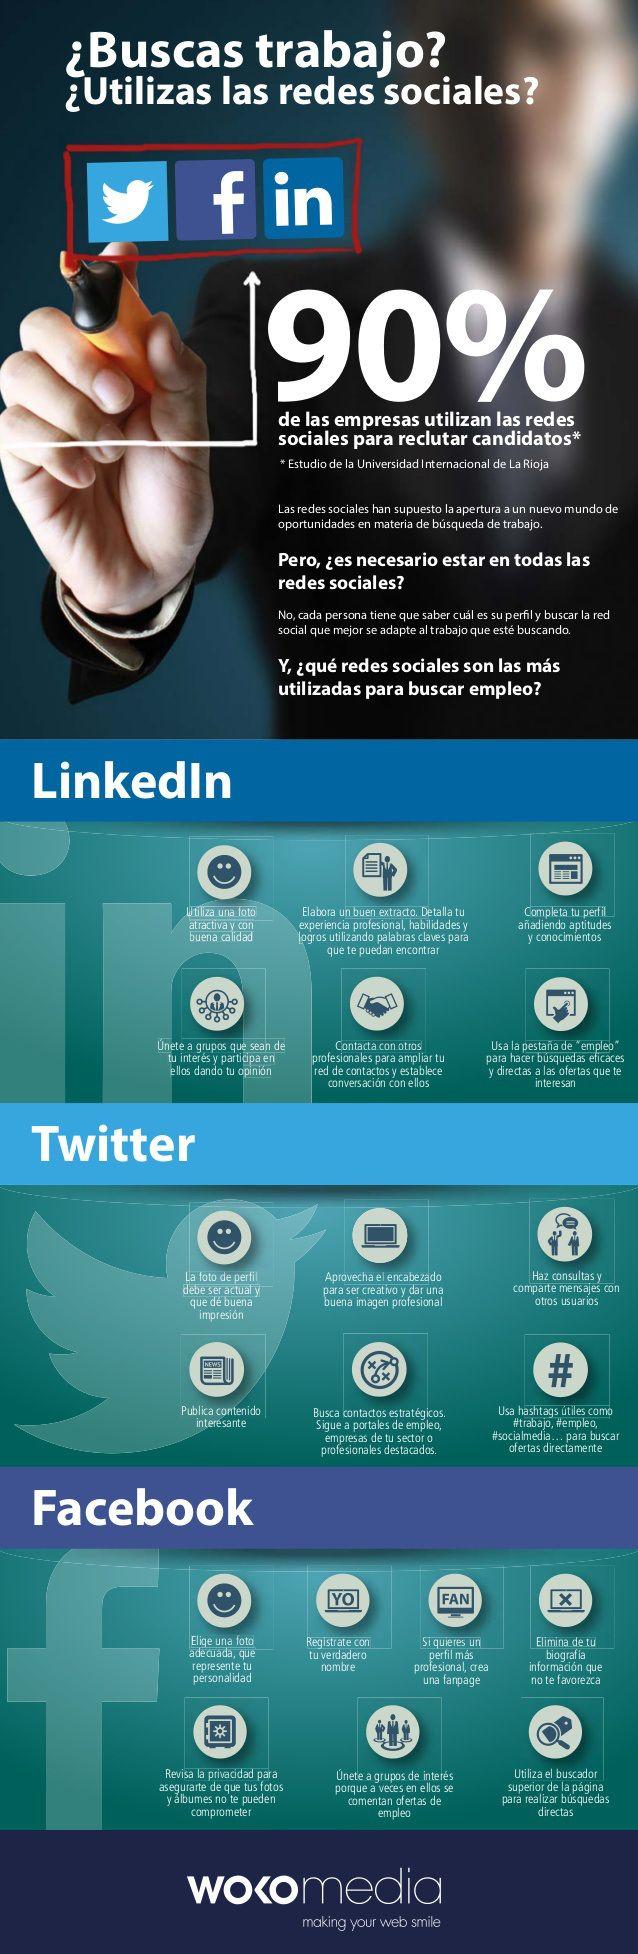 Usa Redes Sociales para buscar #empleo #infografia